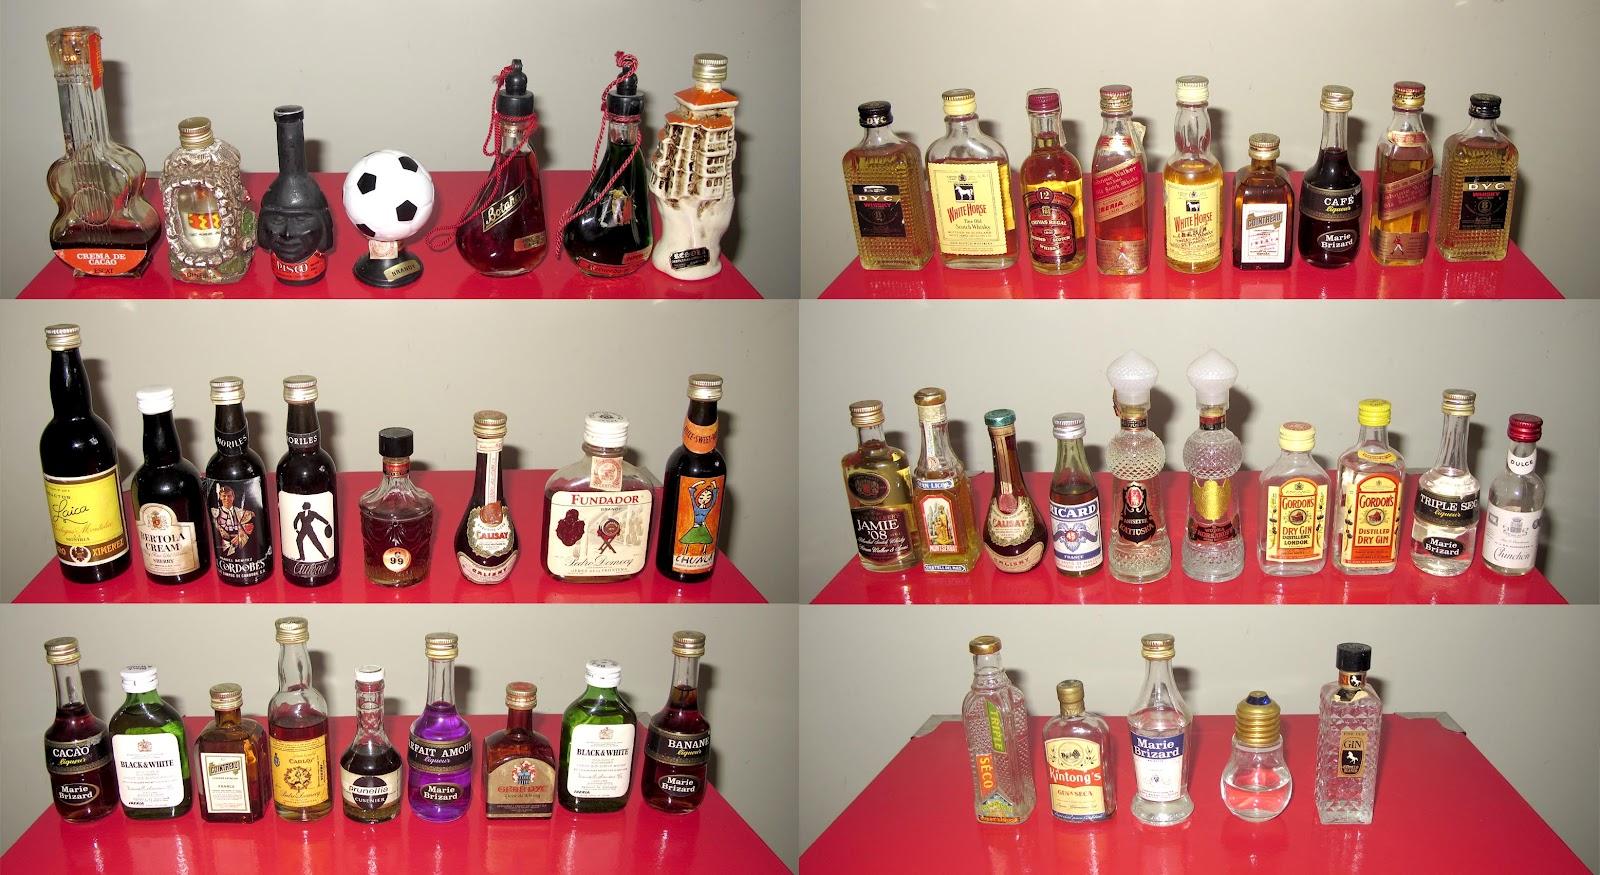 Onda: Colección De 48 Mini Botellas De Alcohol